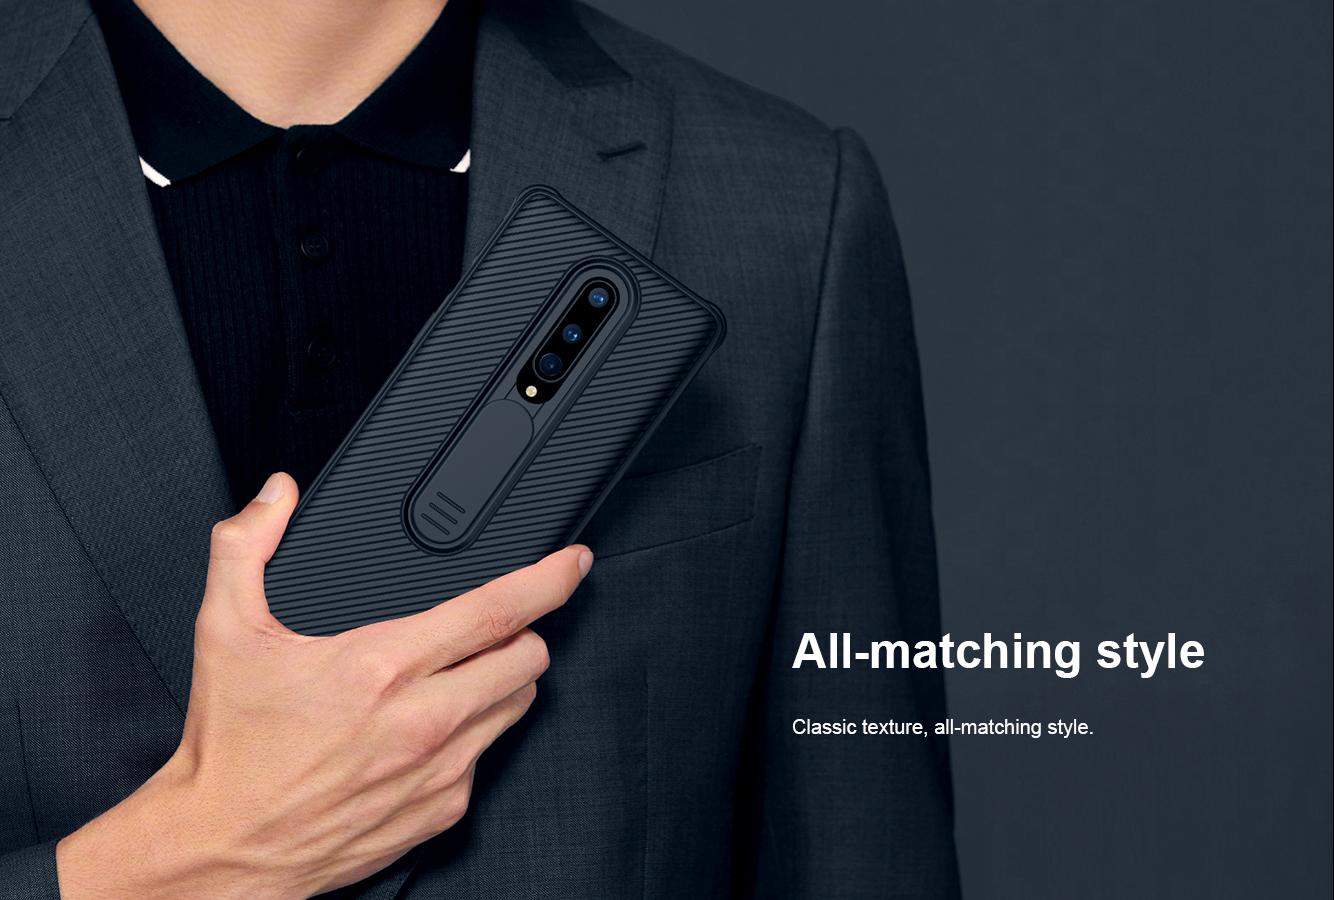 OnePlus_8_CamShield_Pro_Case-09.jpg